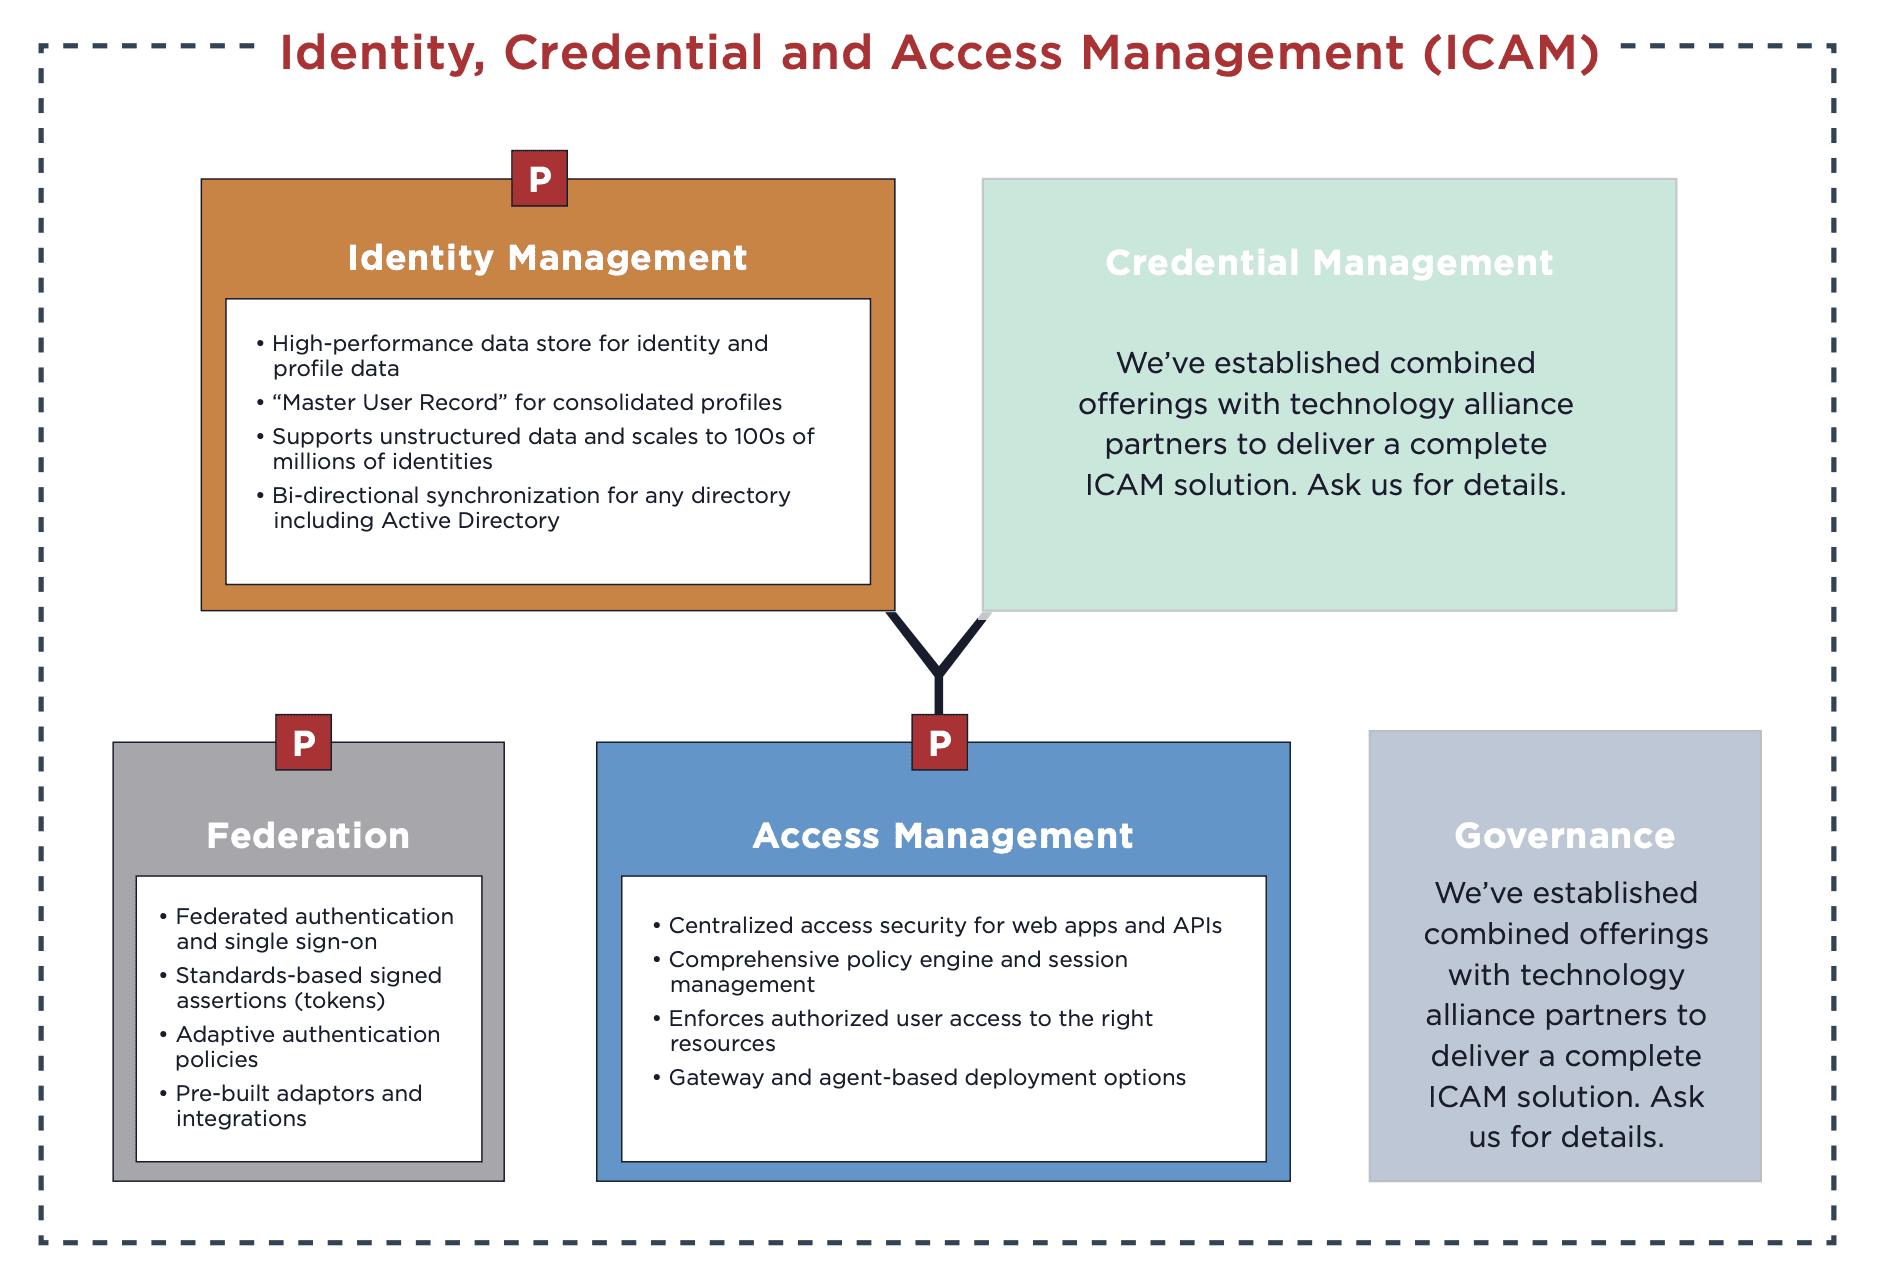 Ping Identity ICAM Graphic Zero Trust Blog 2021